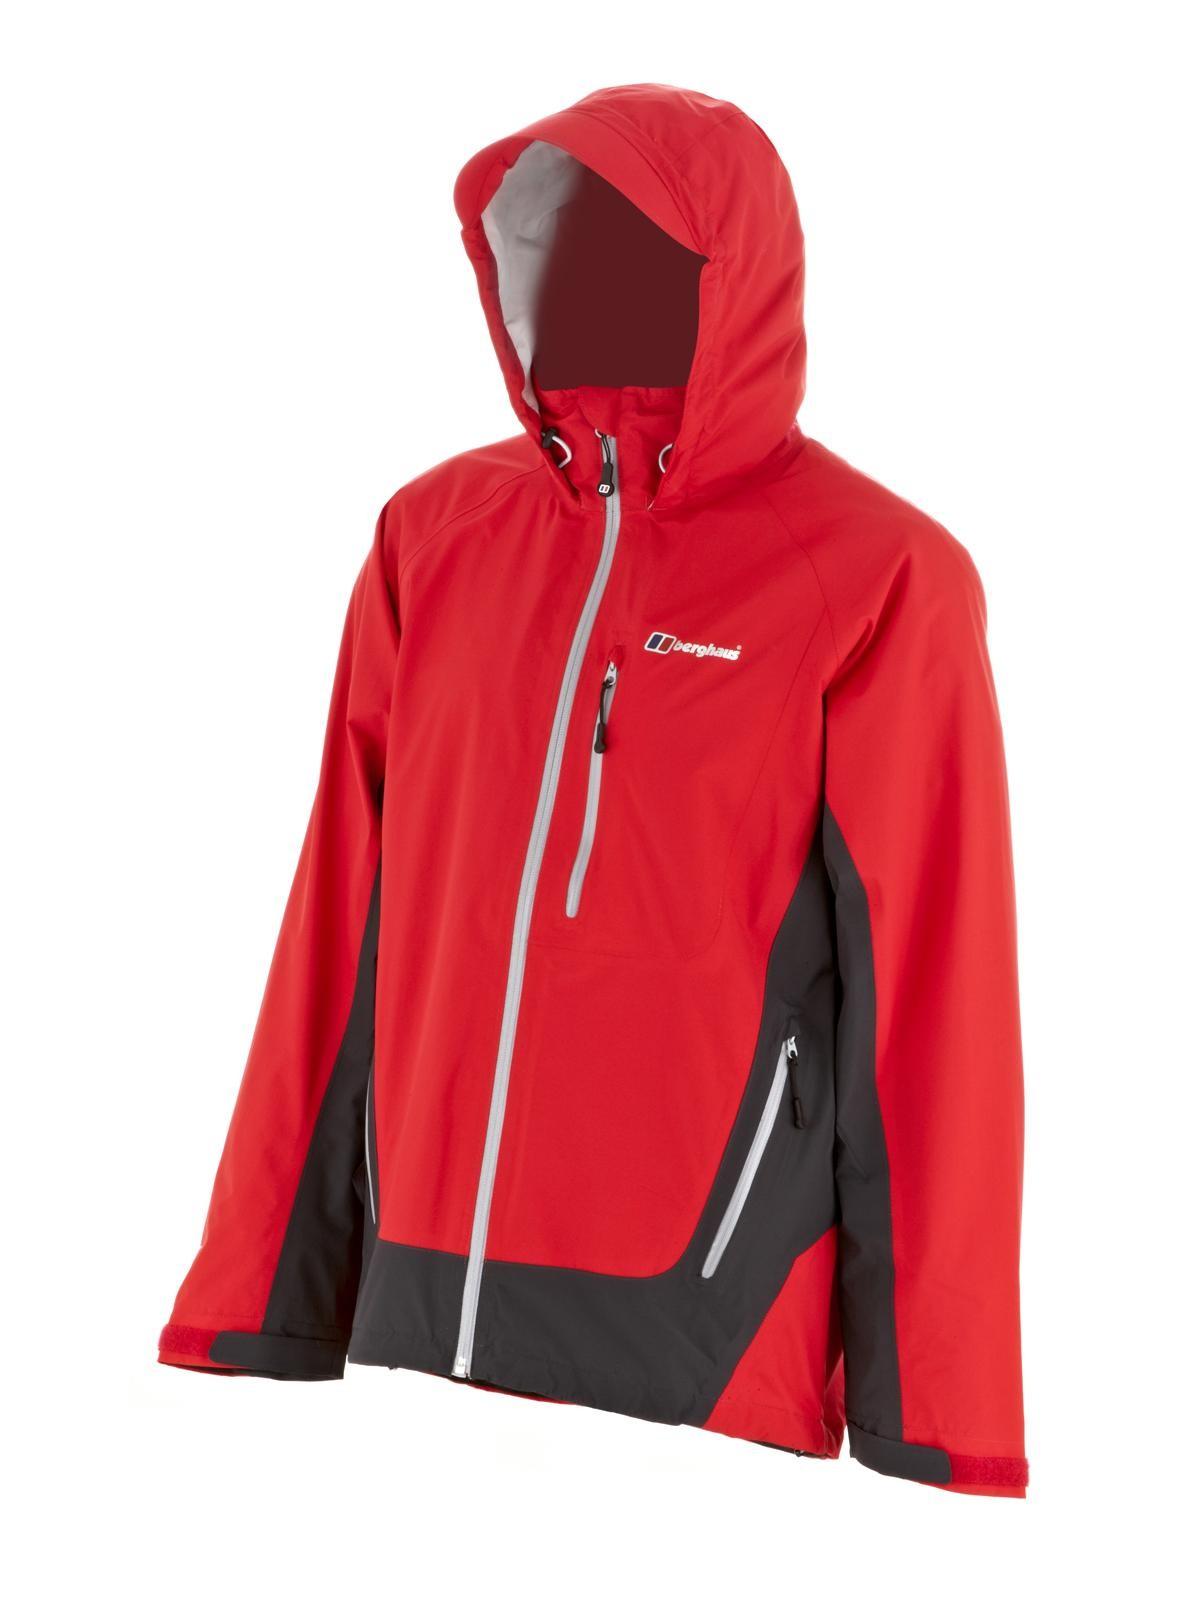 Berghaus Carrock GTX Men's Waterproof Jacket